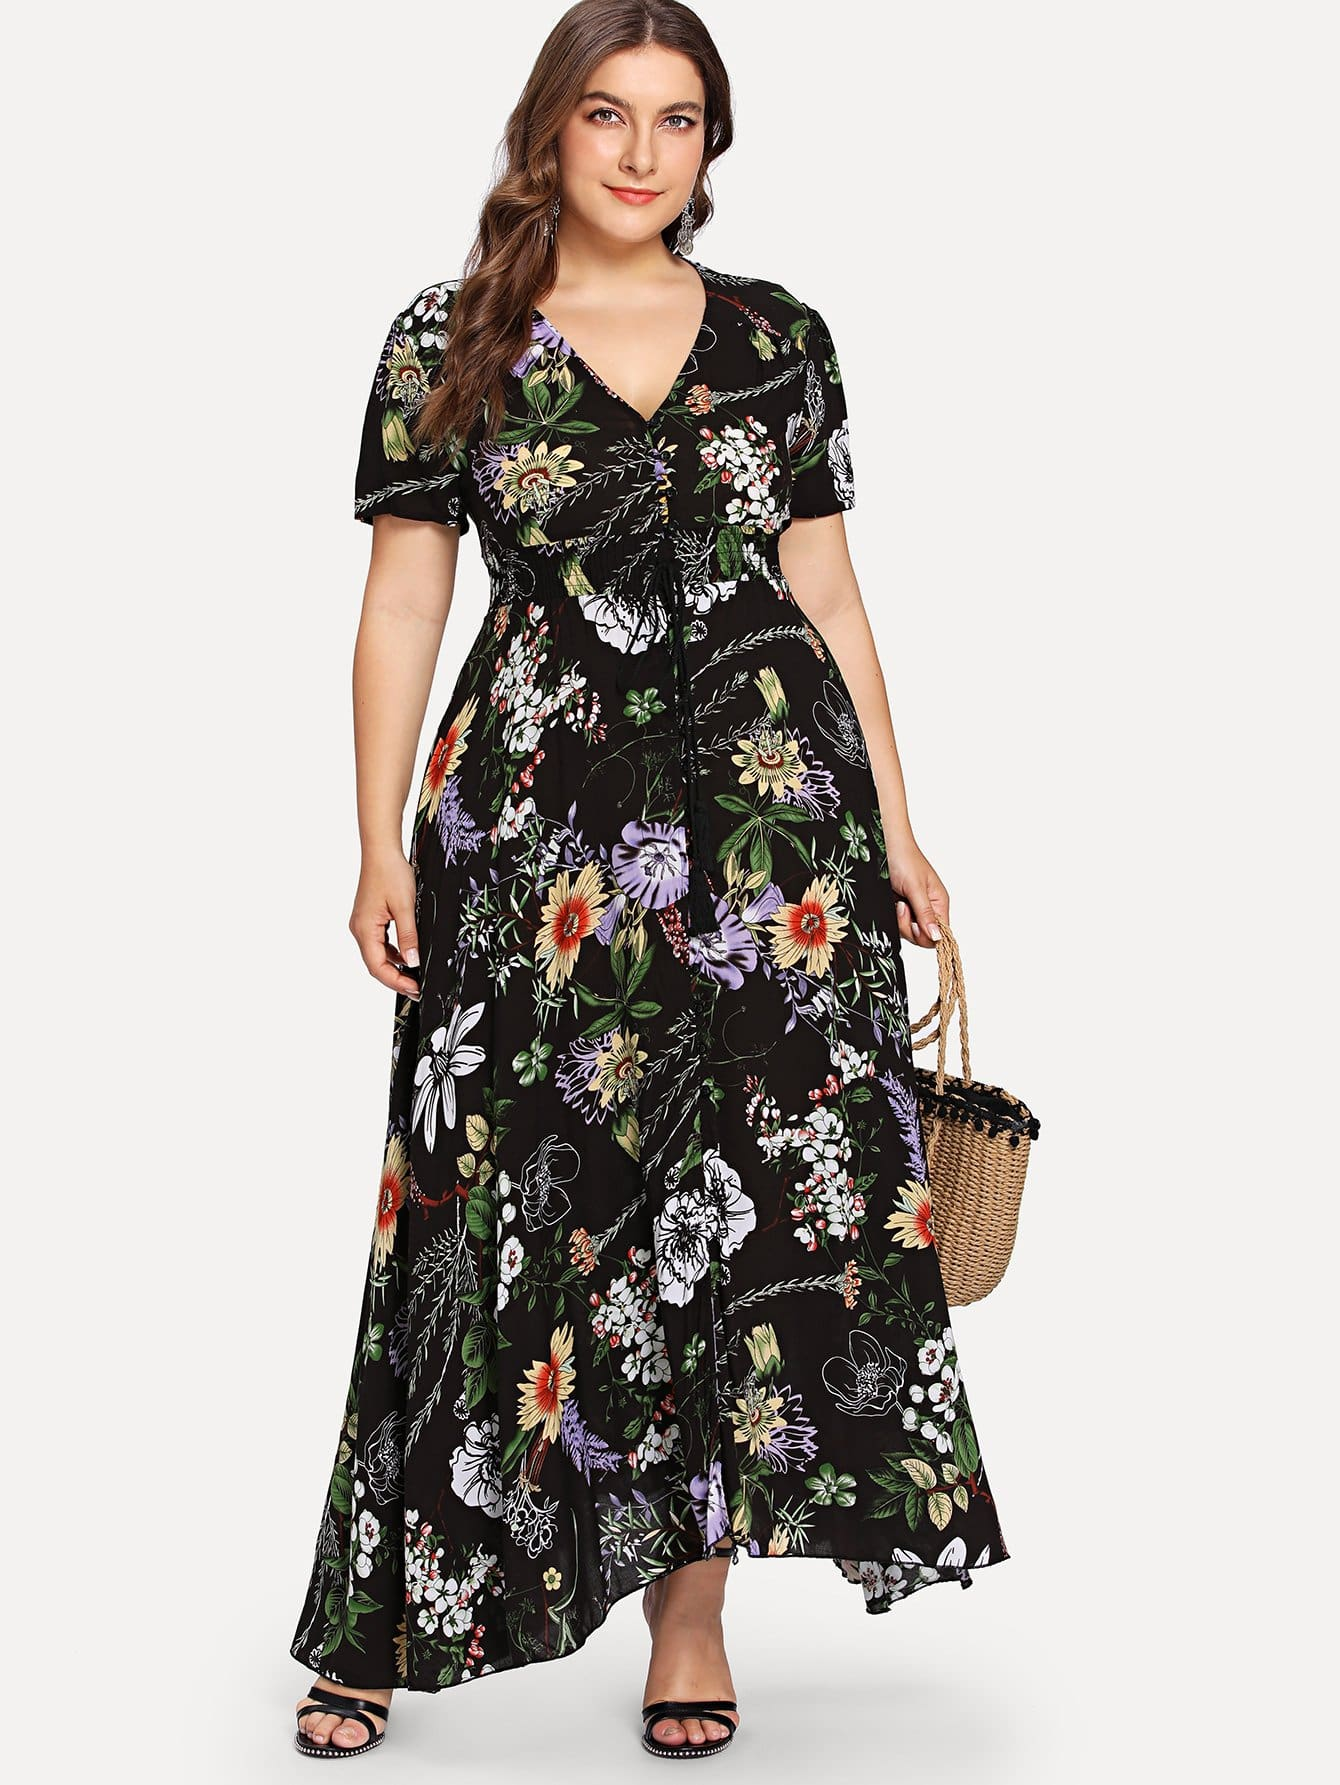 Surplice Neck Botanical Print Belted Dress botanical print surplice wrap dress